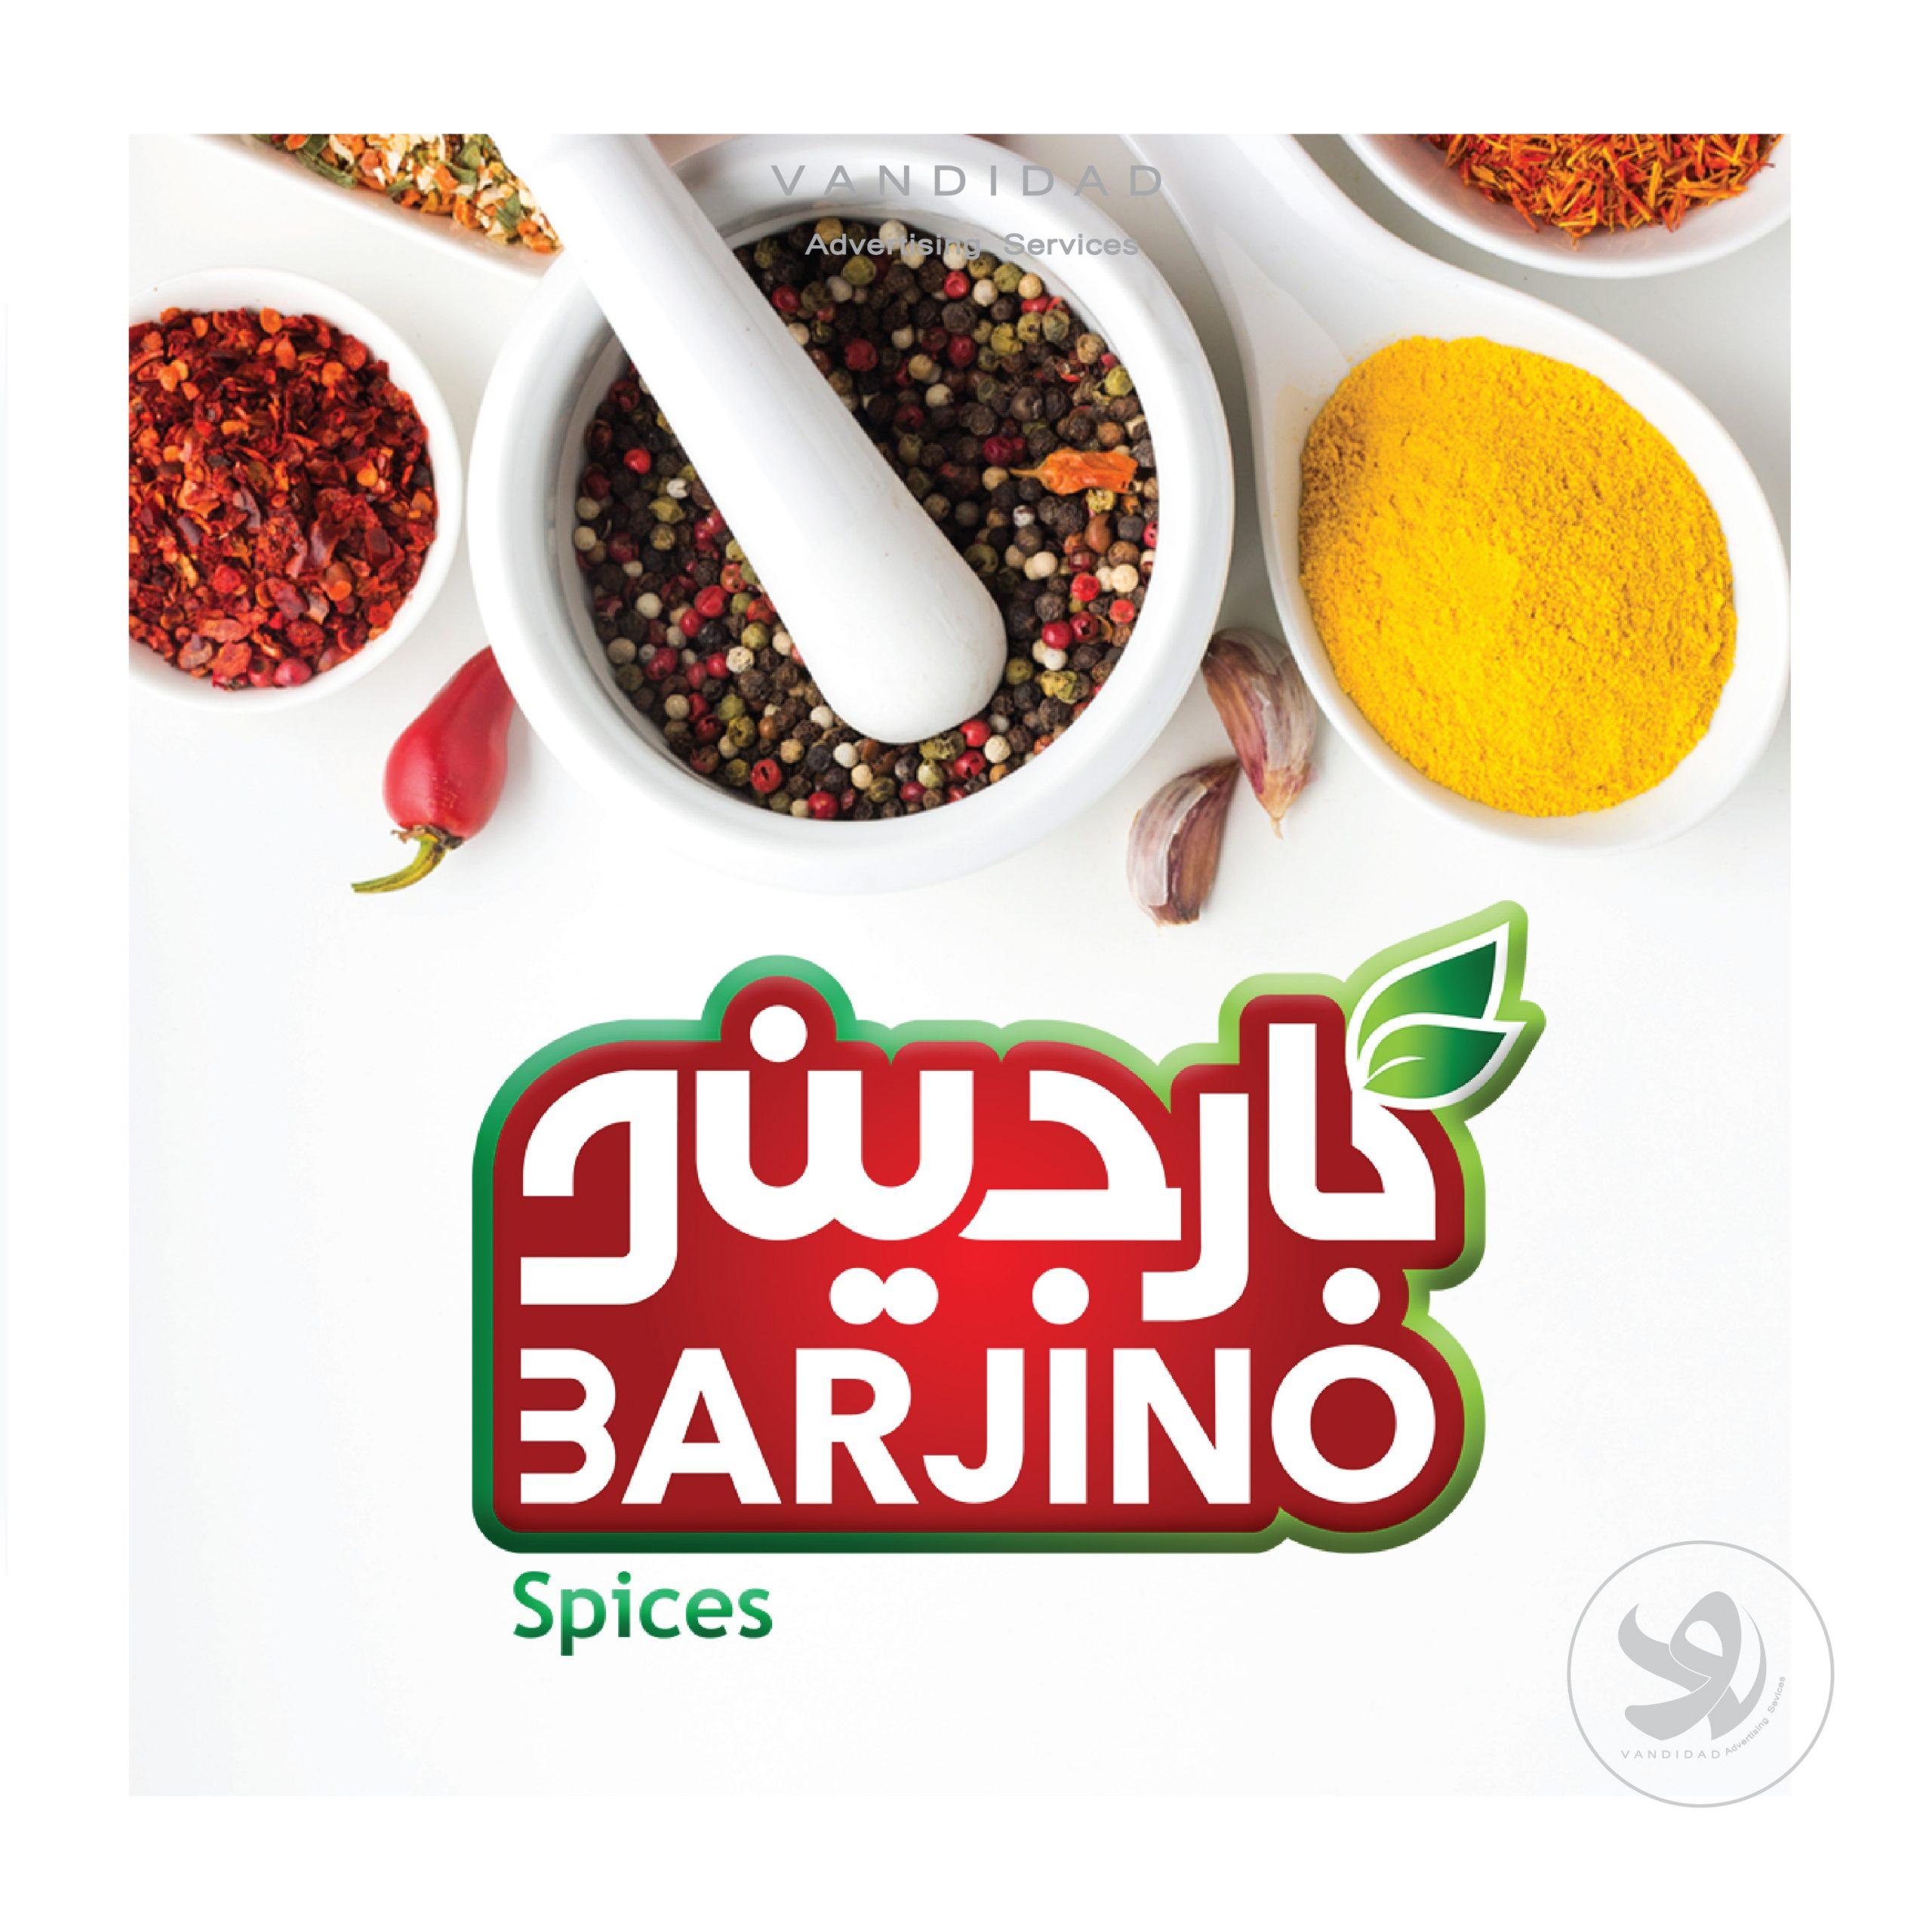 barjino - insta-05